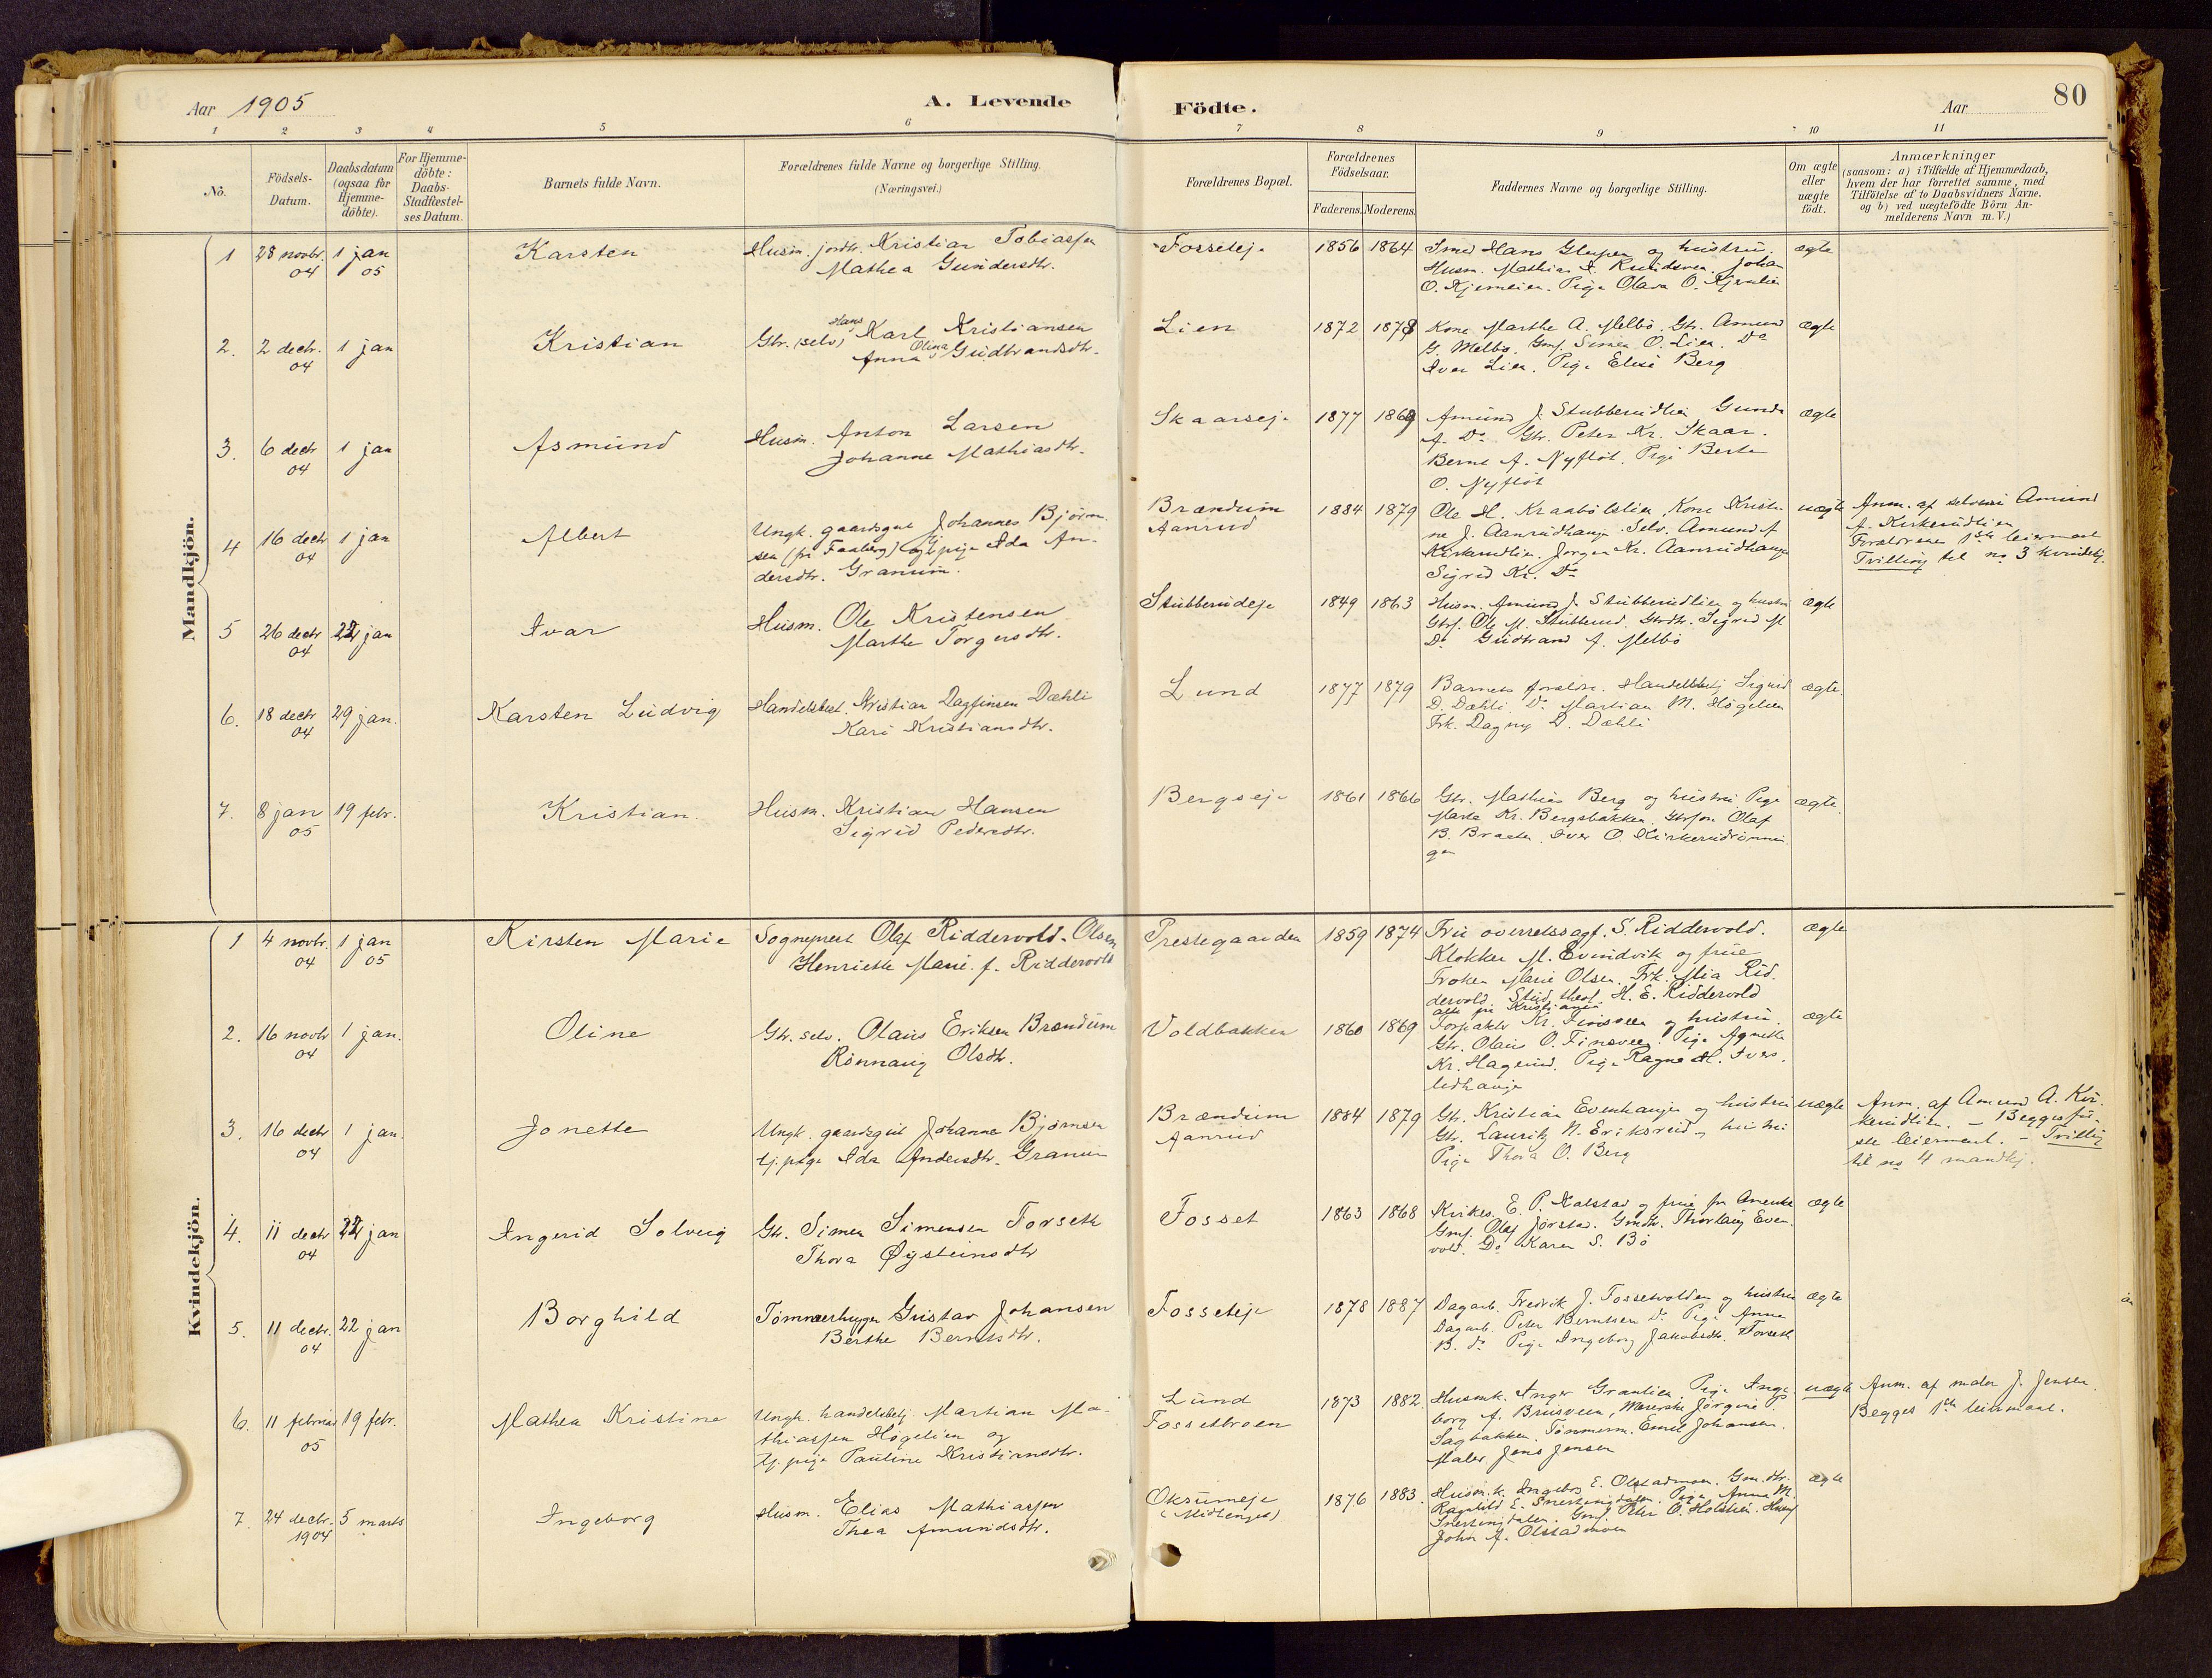 SAH, Vestre Gausdal prestekontor, Ministerialbok nr. 1, 1887-1914, s. 80